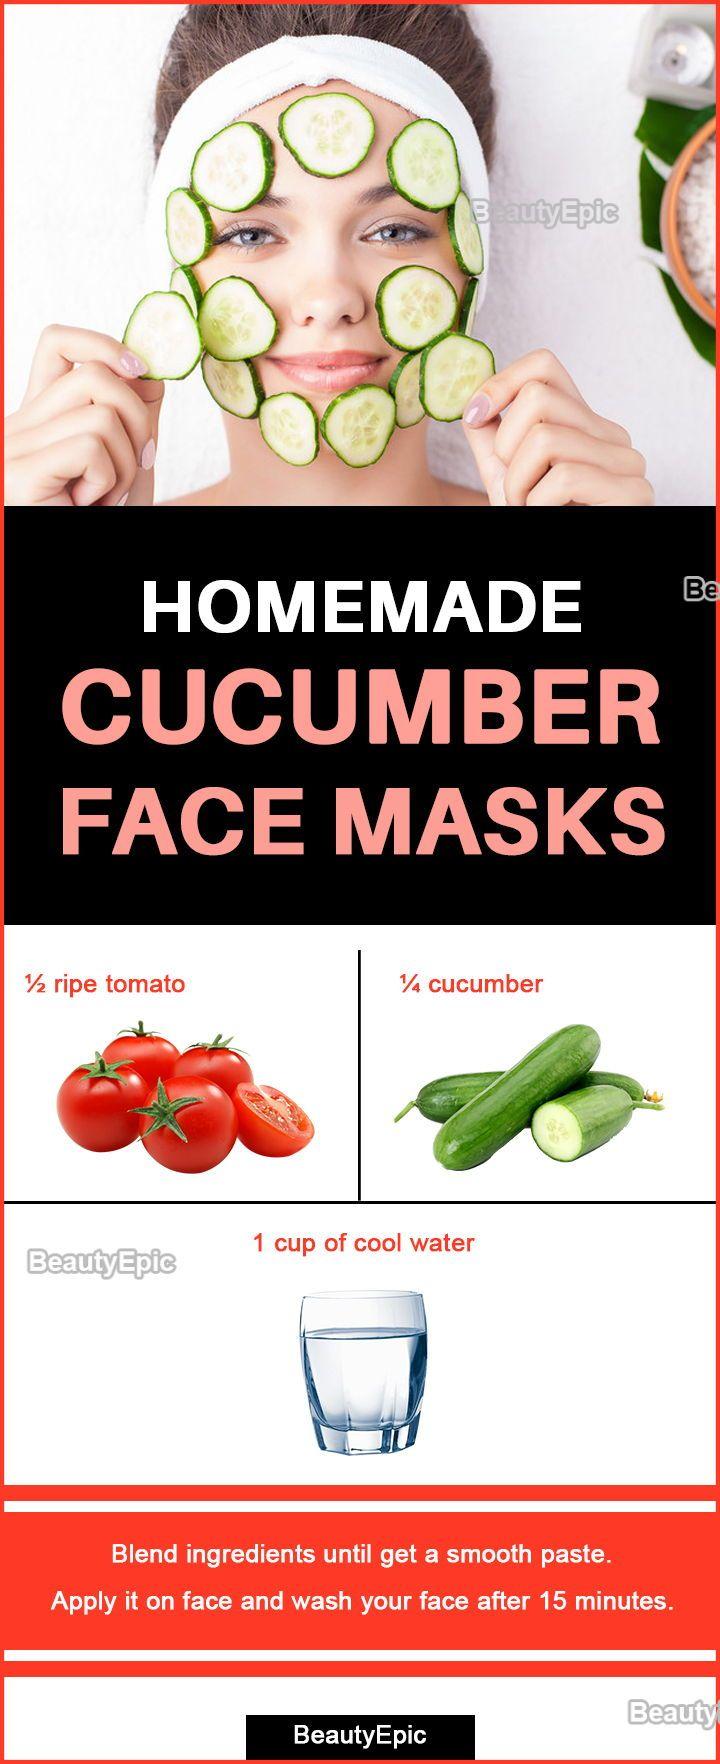 Cucumber facial benefits final, sorry